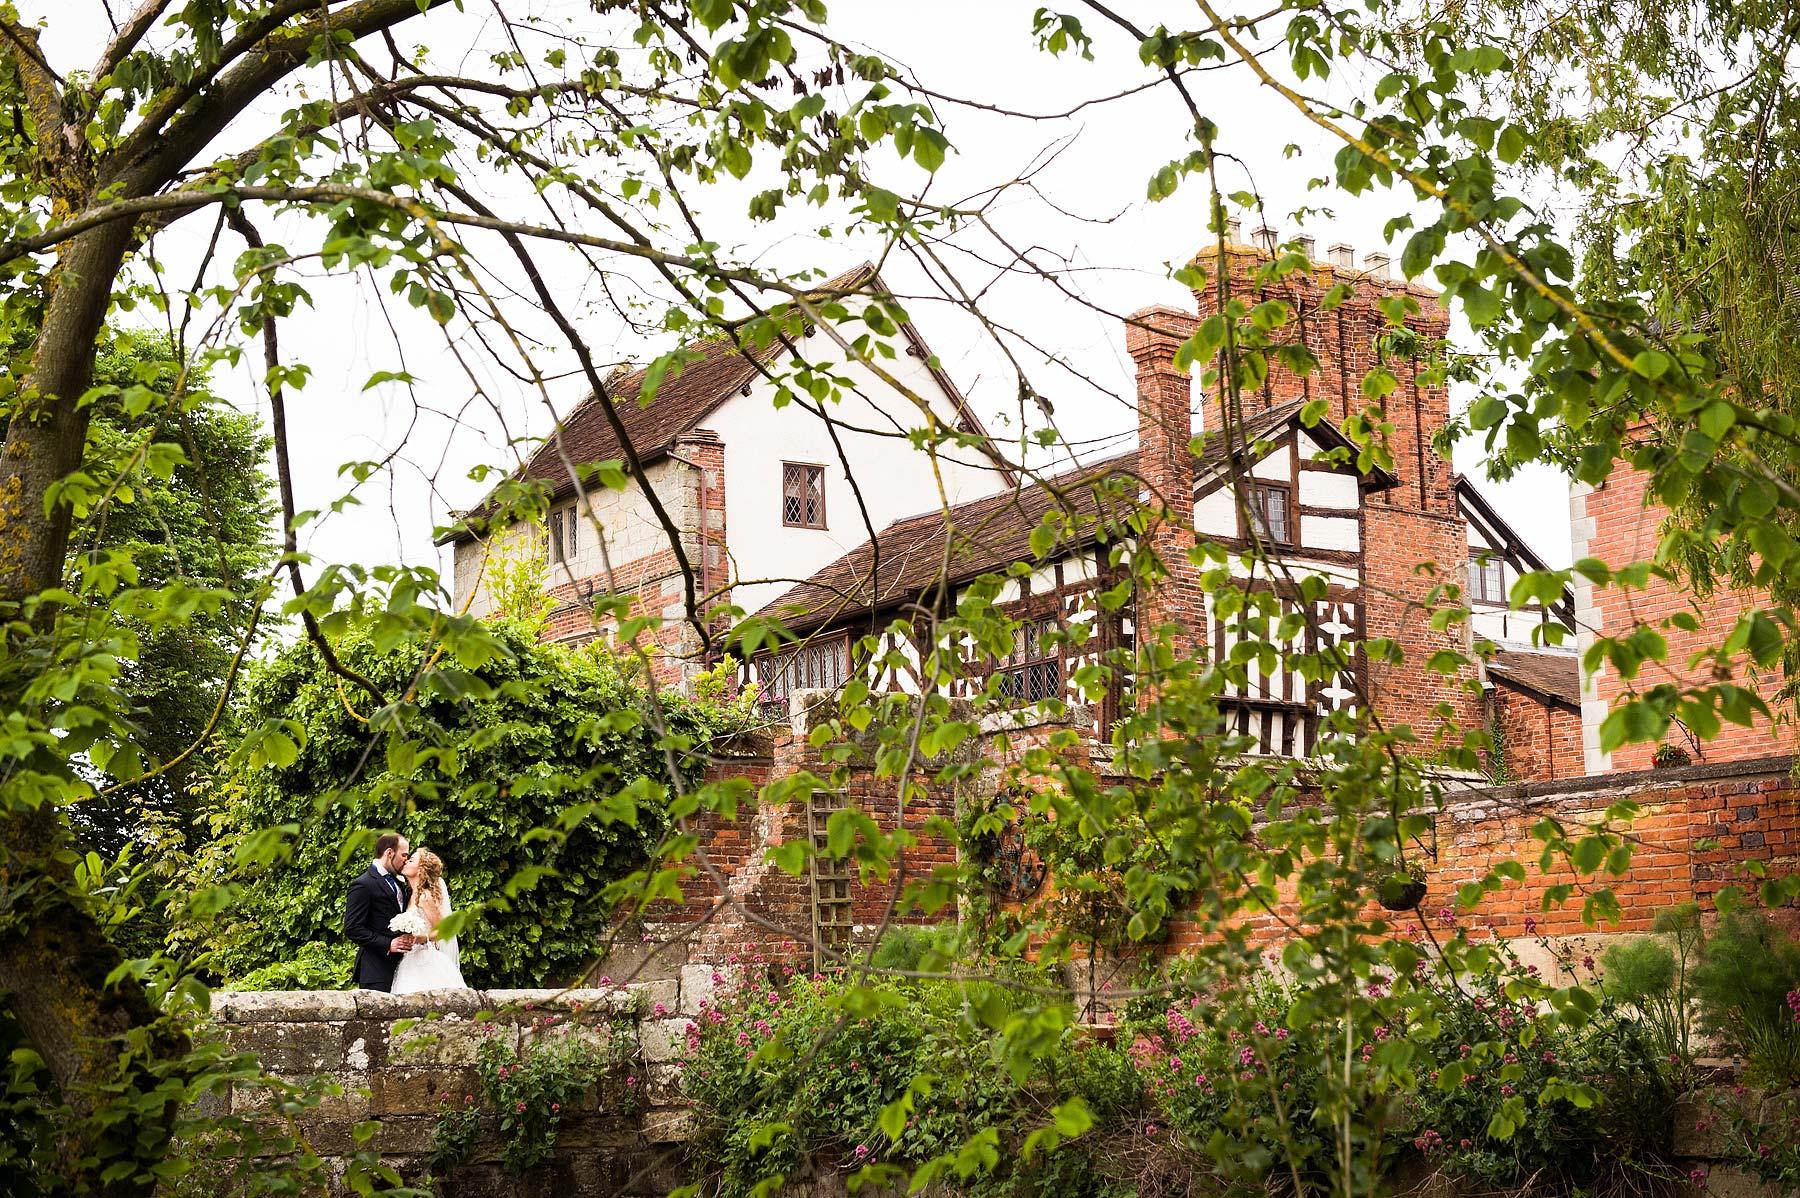 albright-hussey-manor-wedding-photographers-001